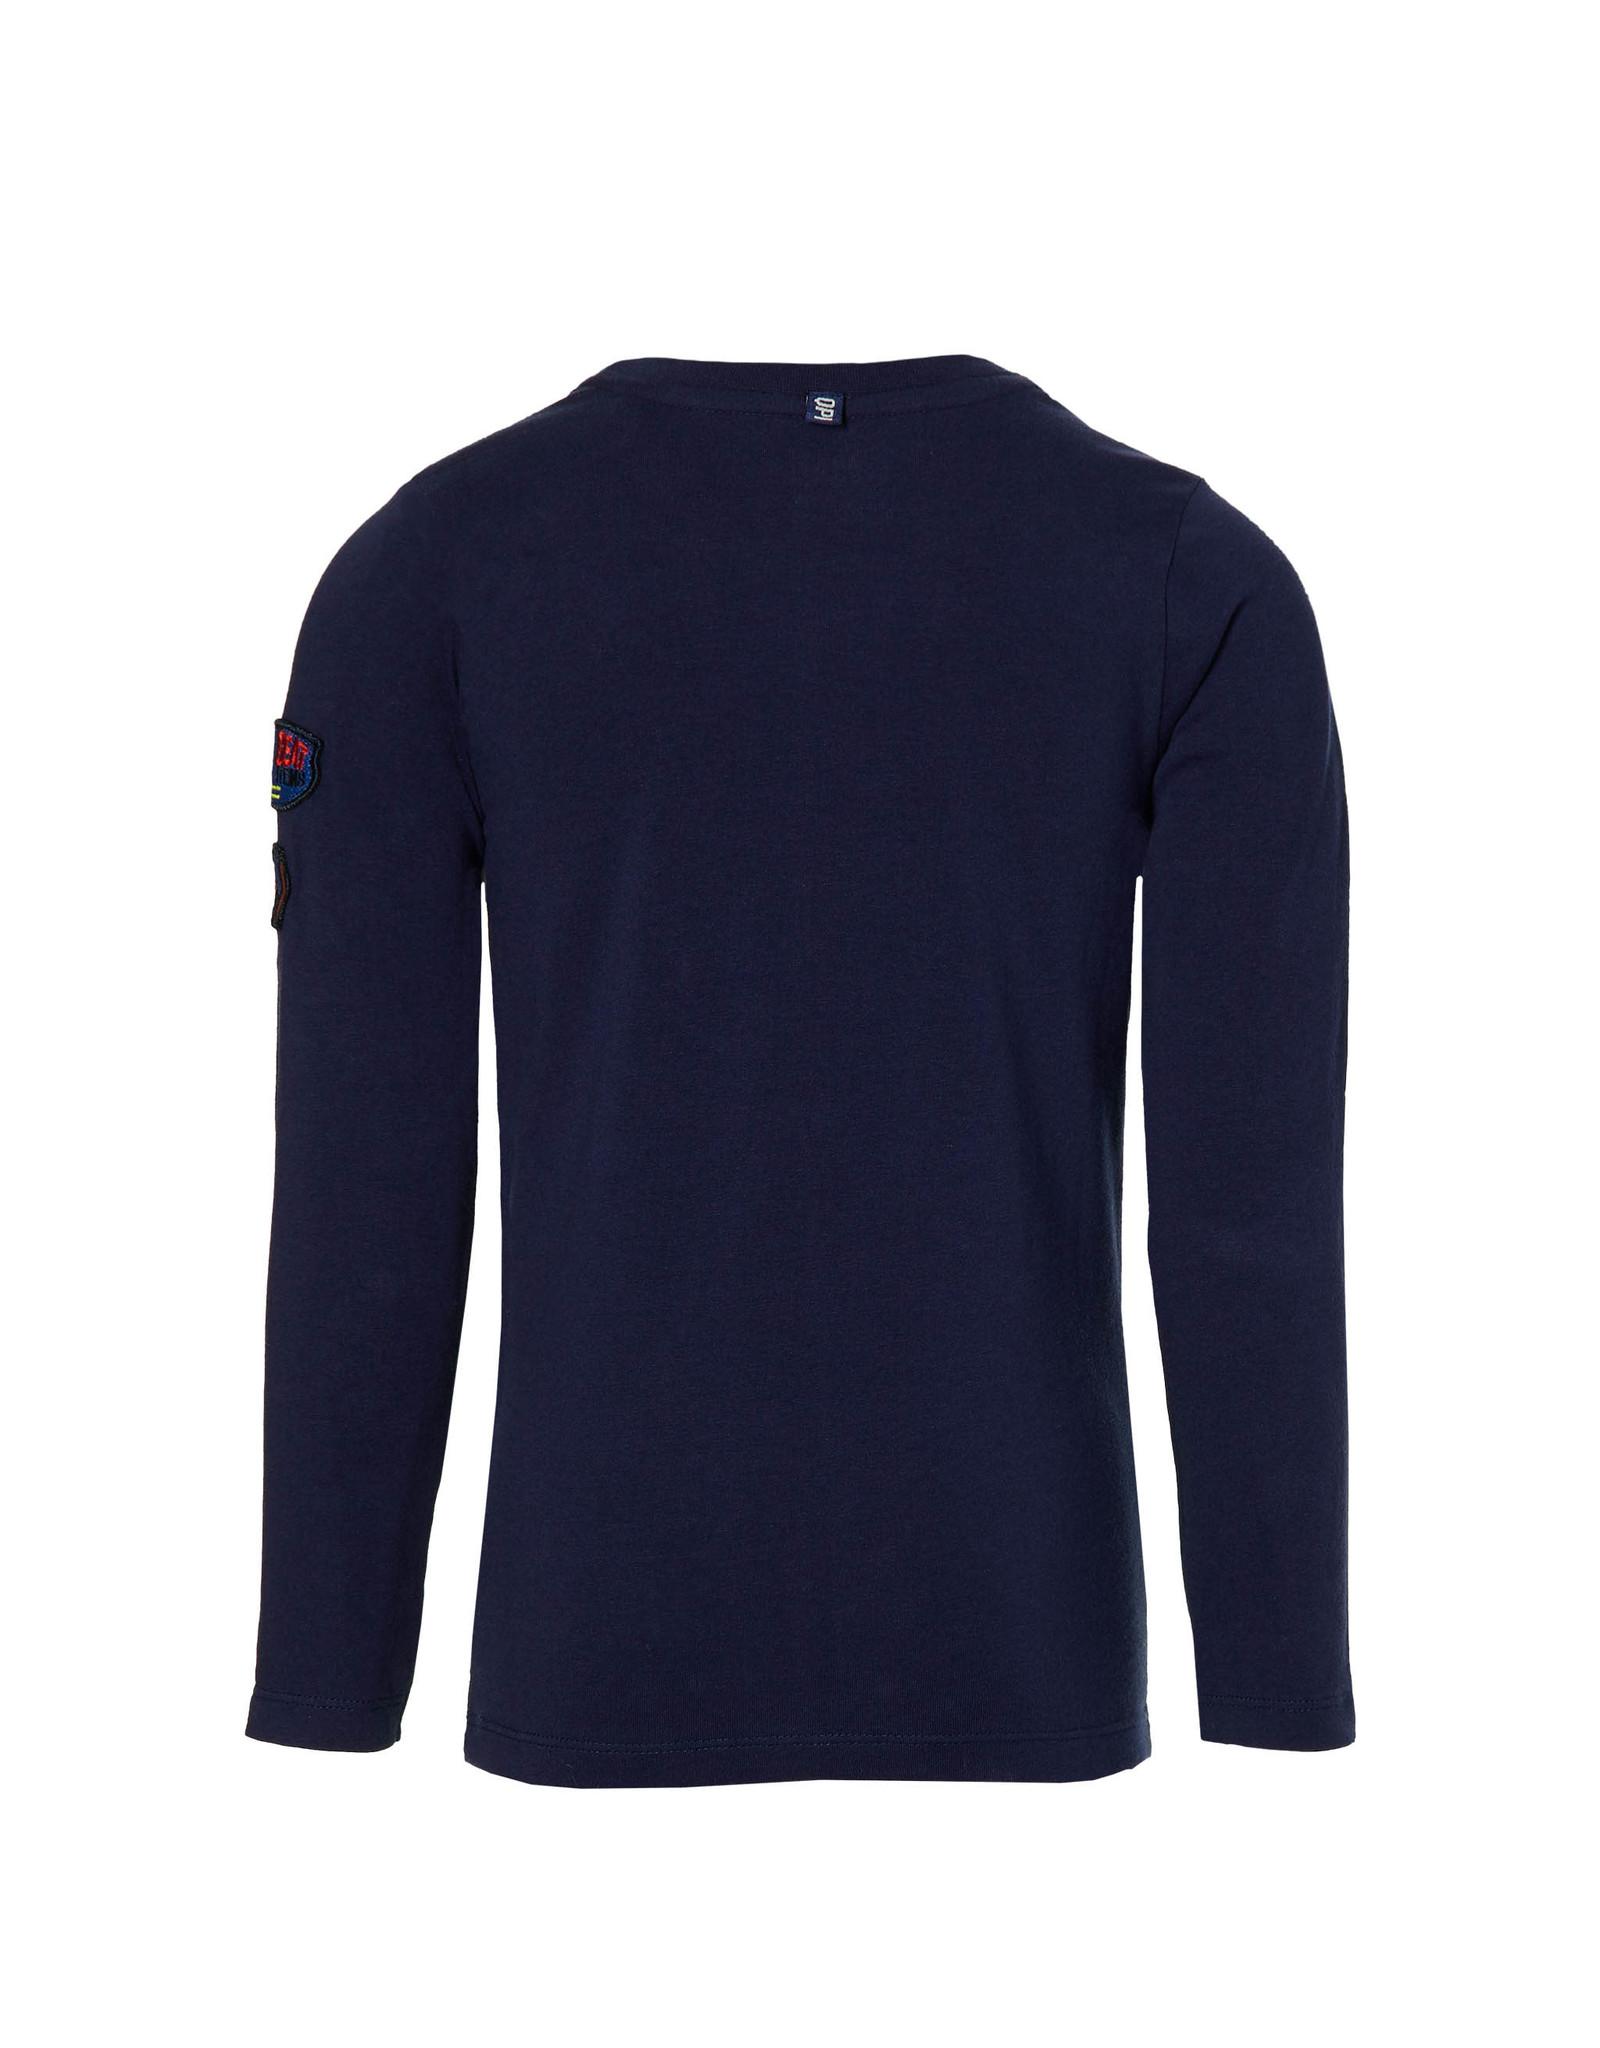 Quapi Quapi jongens shirt Dali Dark Blue